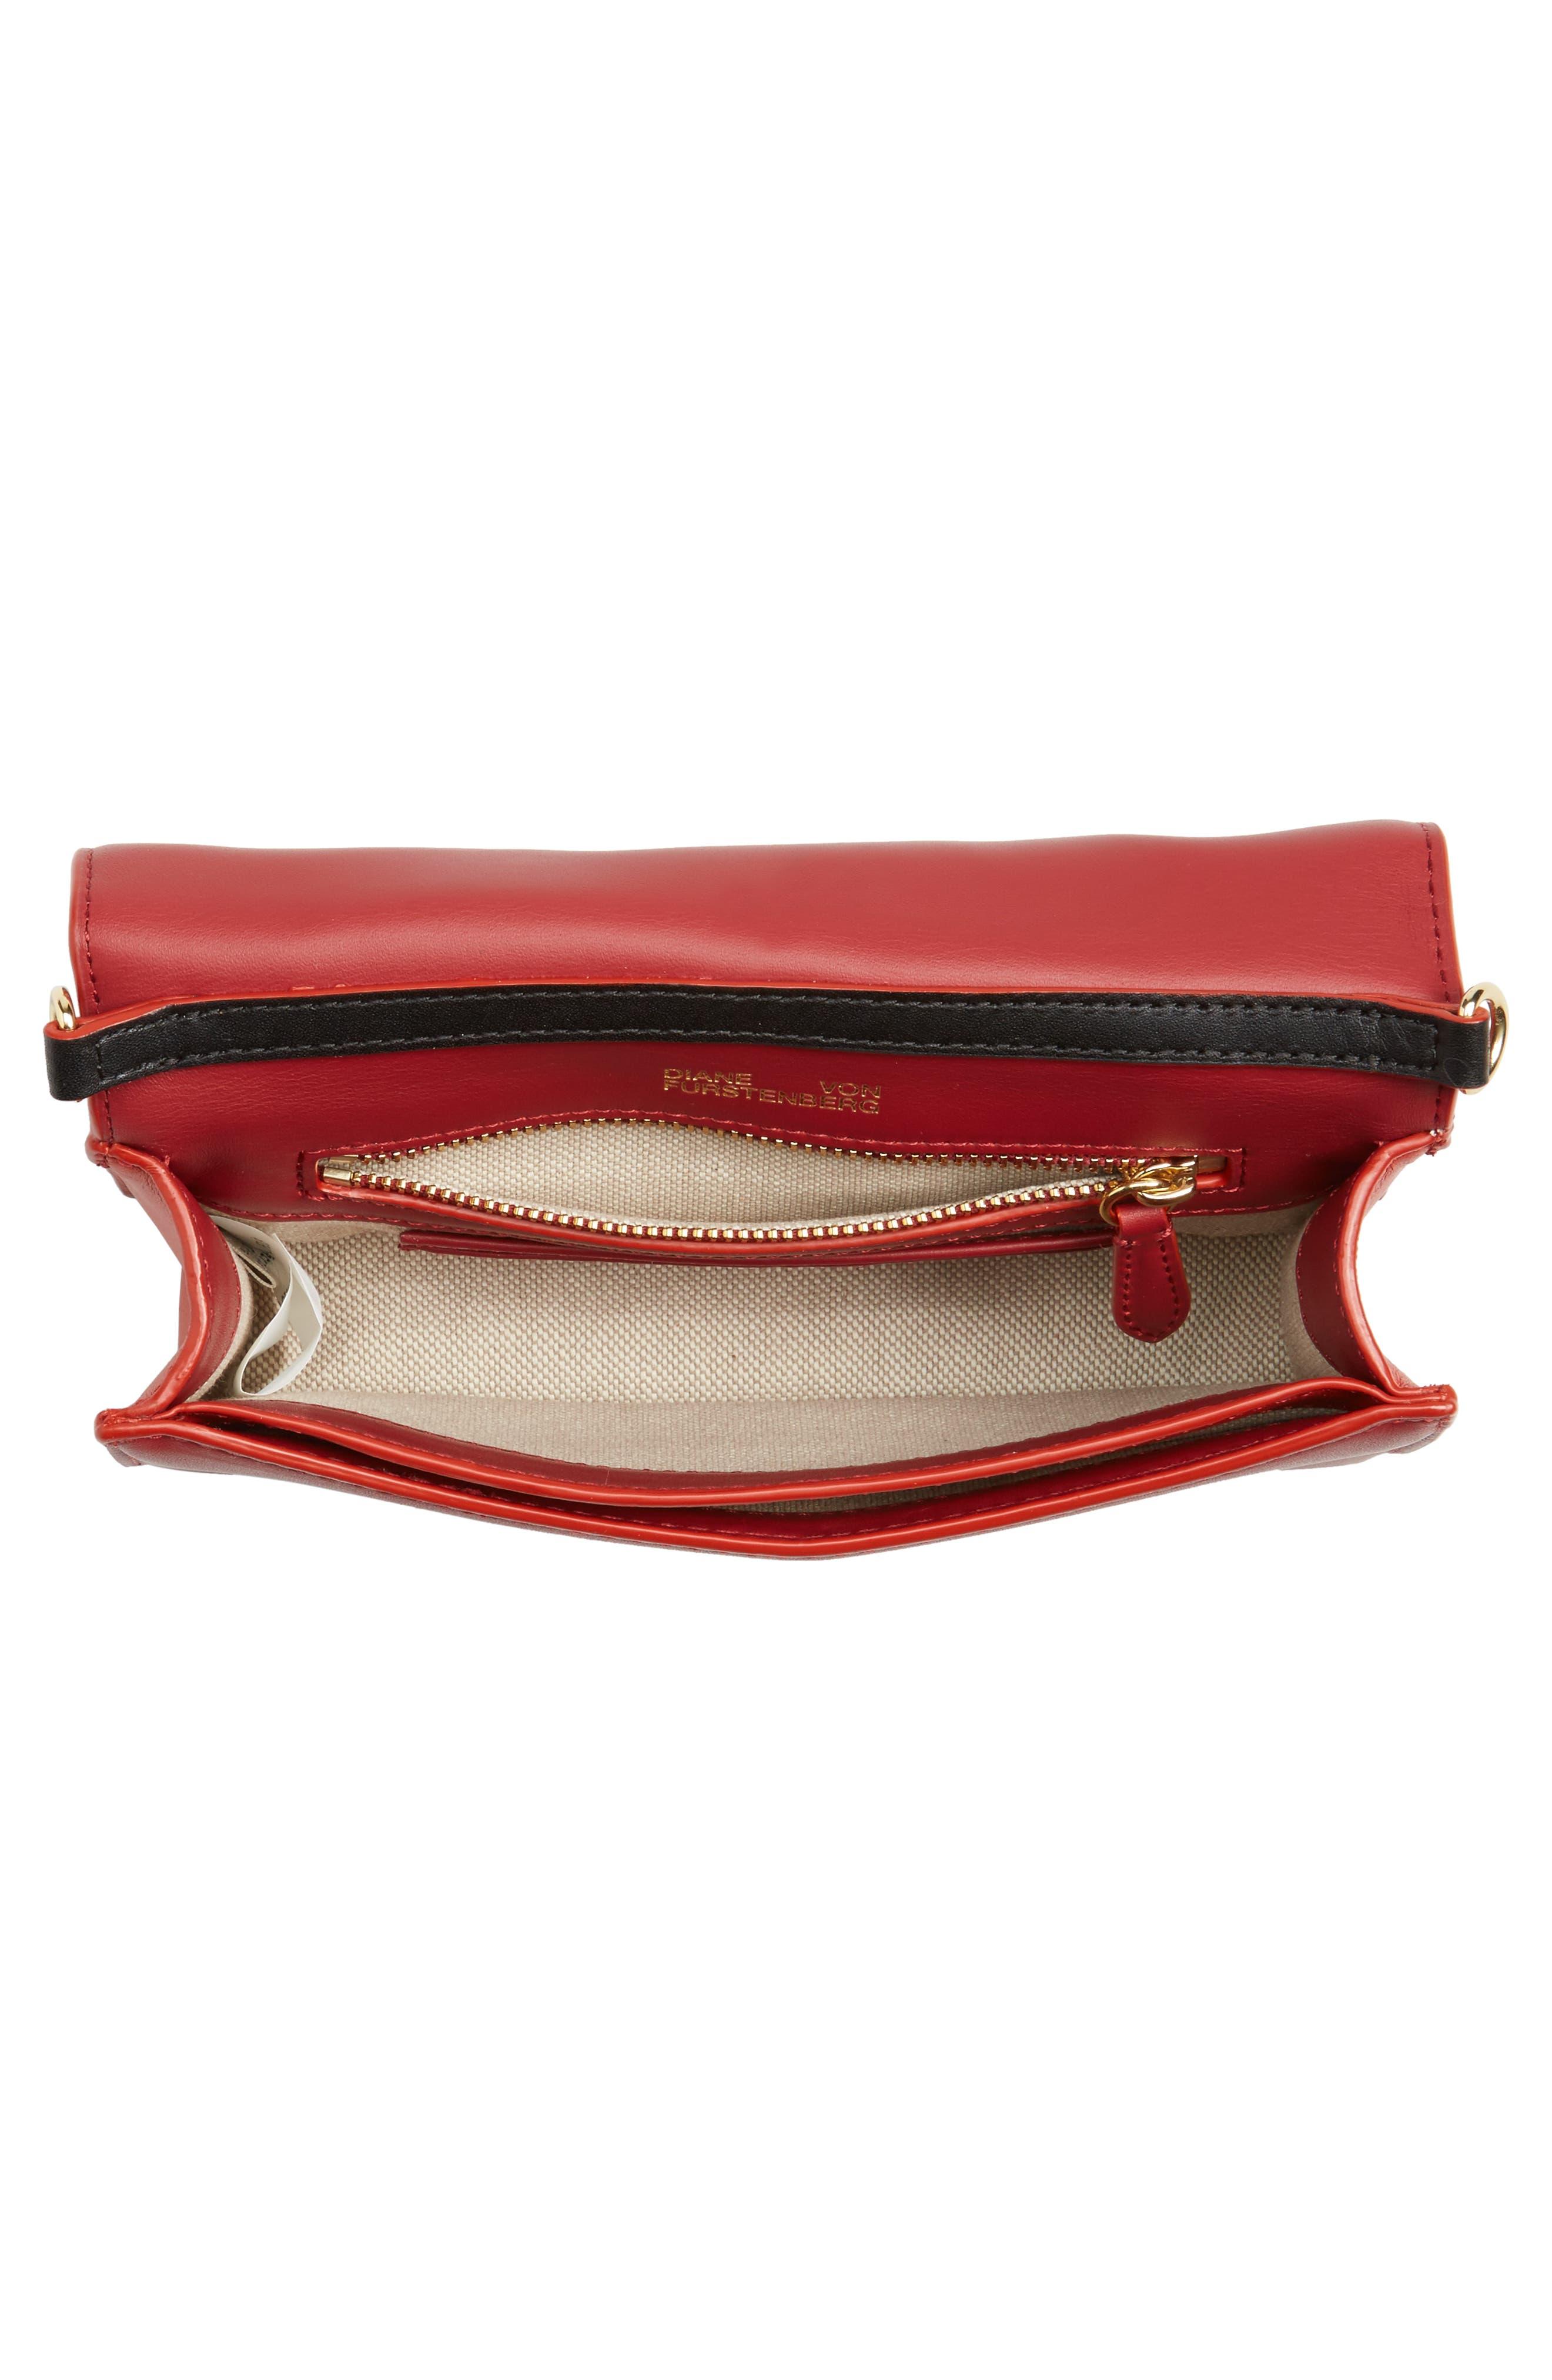 Soirée Genuine Calf Hair & Leather Convertible Shoulder Bag,                             Alternate thumbnail 5, color,                             537